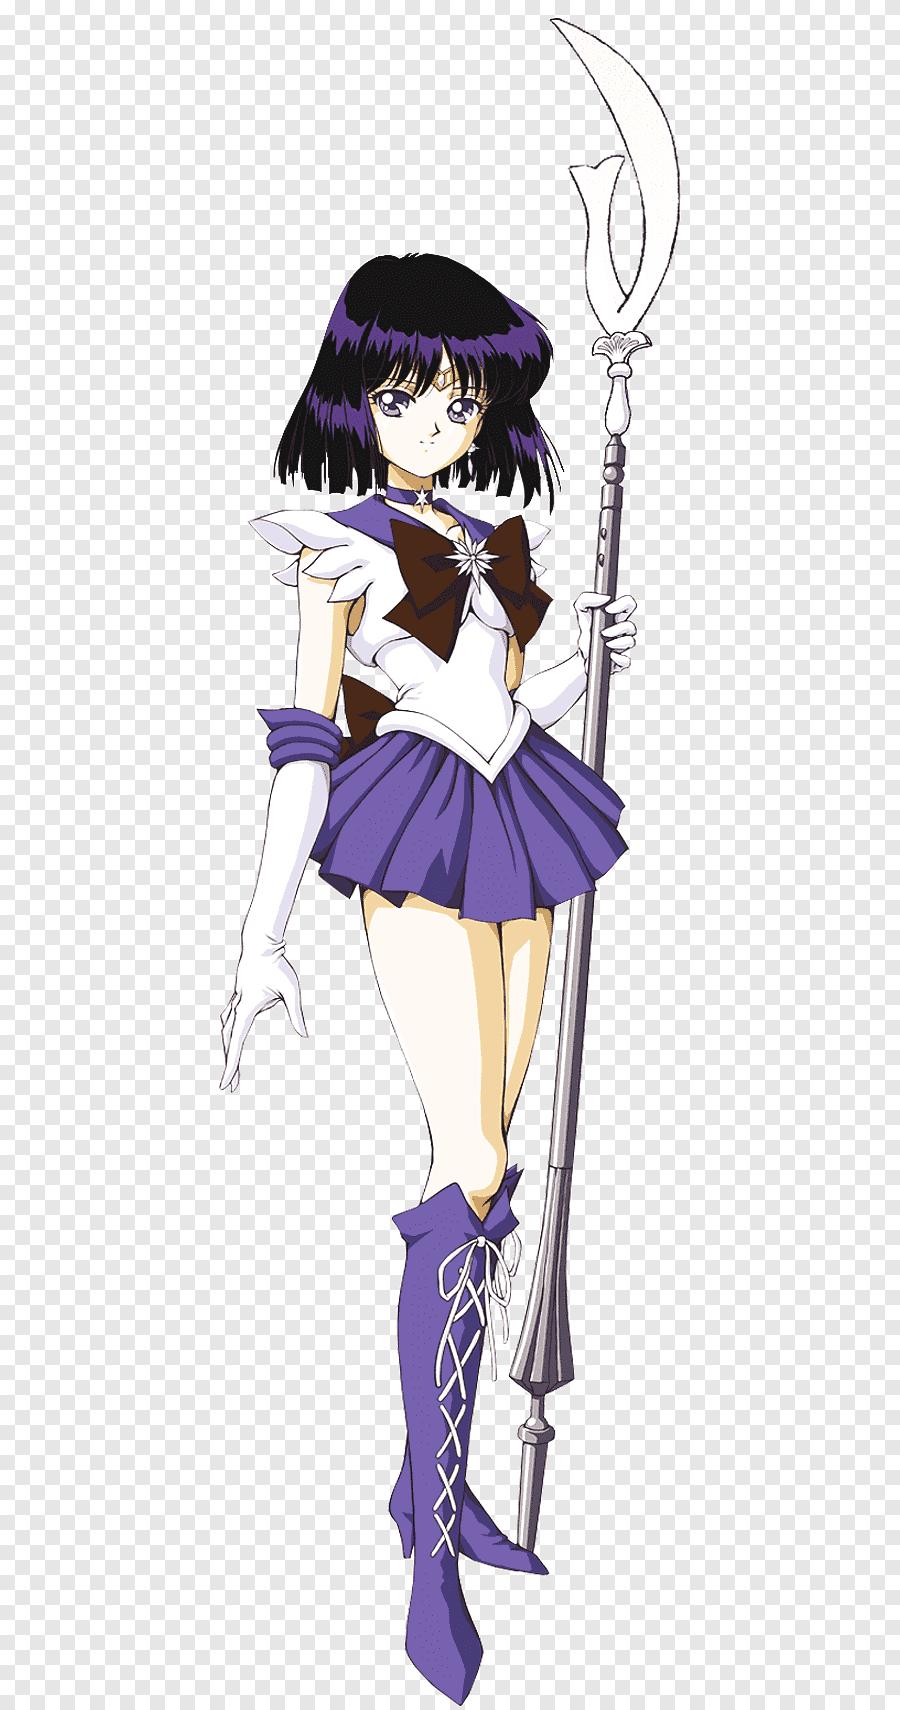 Sailor Saturn Sailor Moon Sailor Neptune Sailor Mercury Sailor Jupiter. Sailor Saturn. purple. black Hair png | PNGEgg